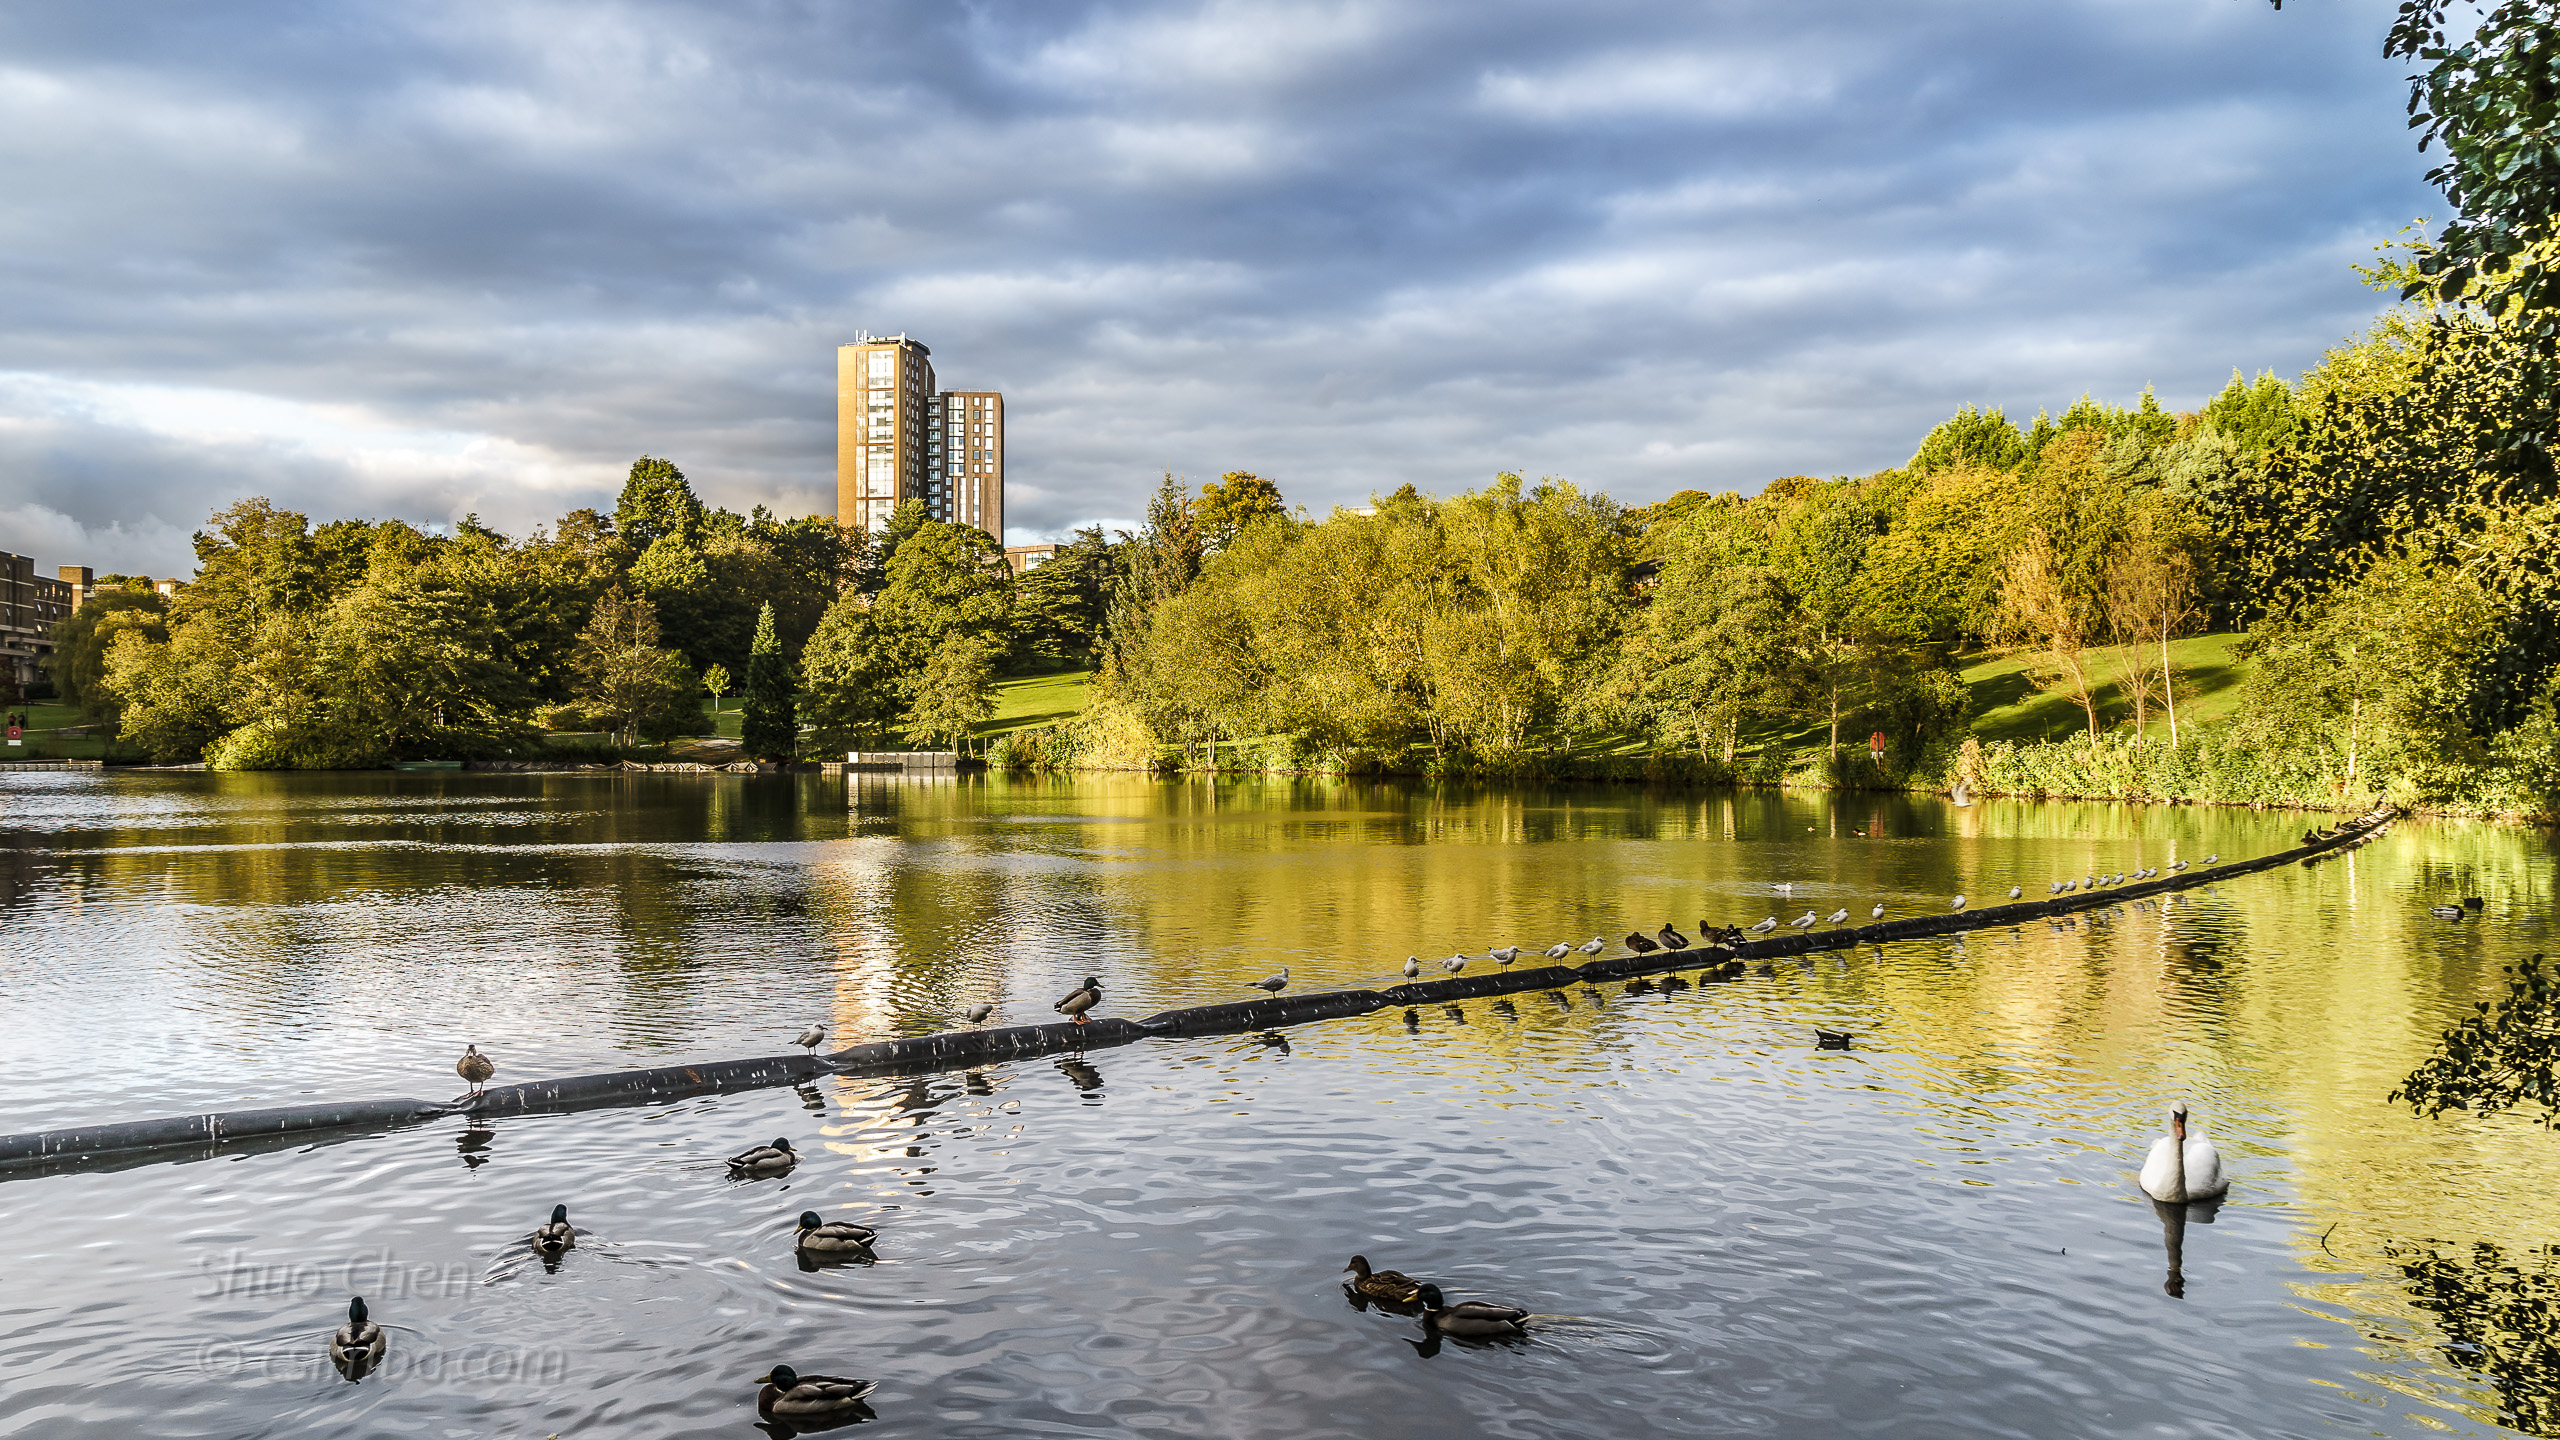 20161006 The University of Birmingham - Pond